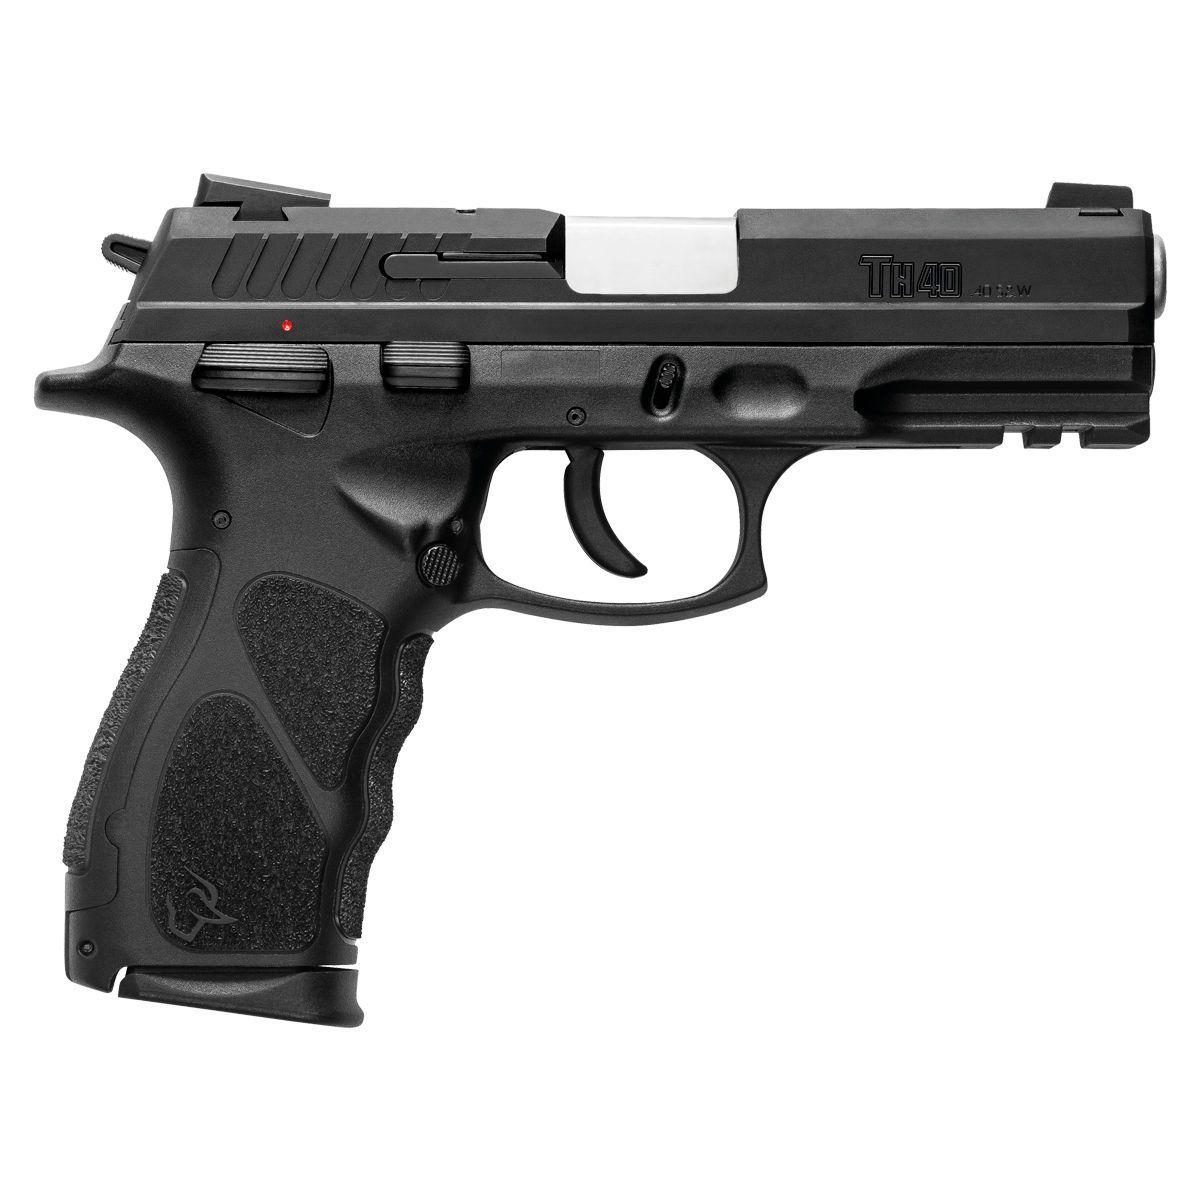 Pistola Taurus TH40 - Cal .40 S&W 15+1 Tiros Tenox